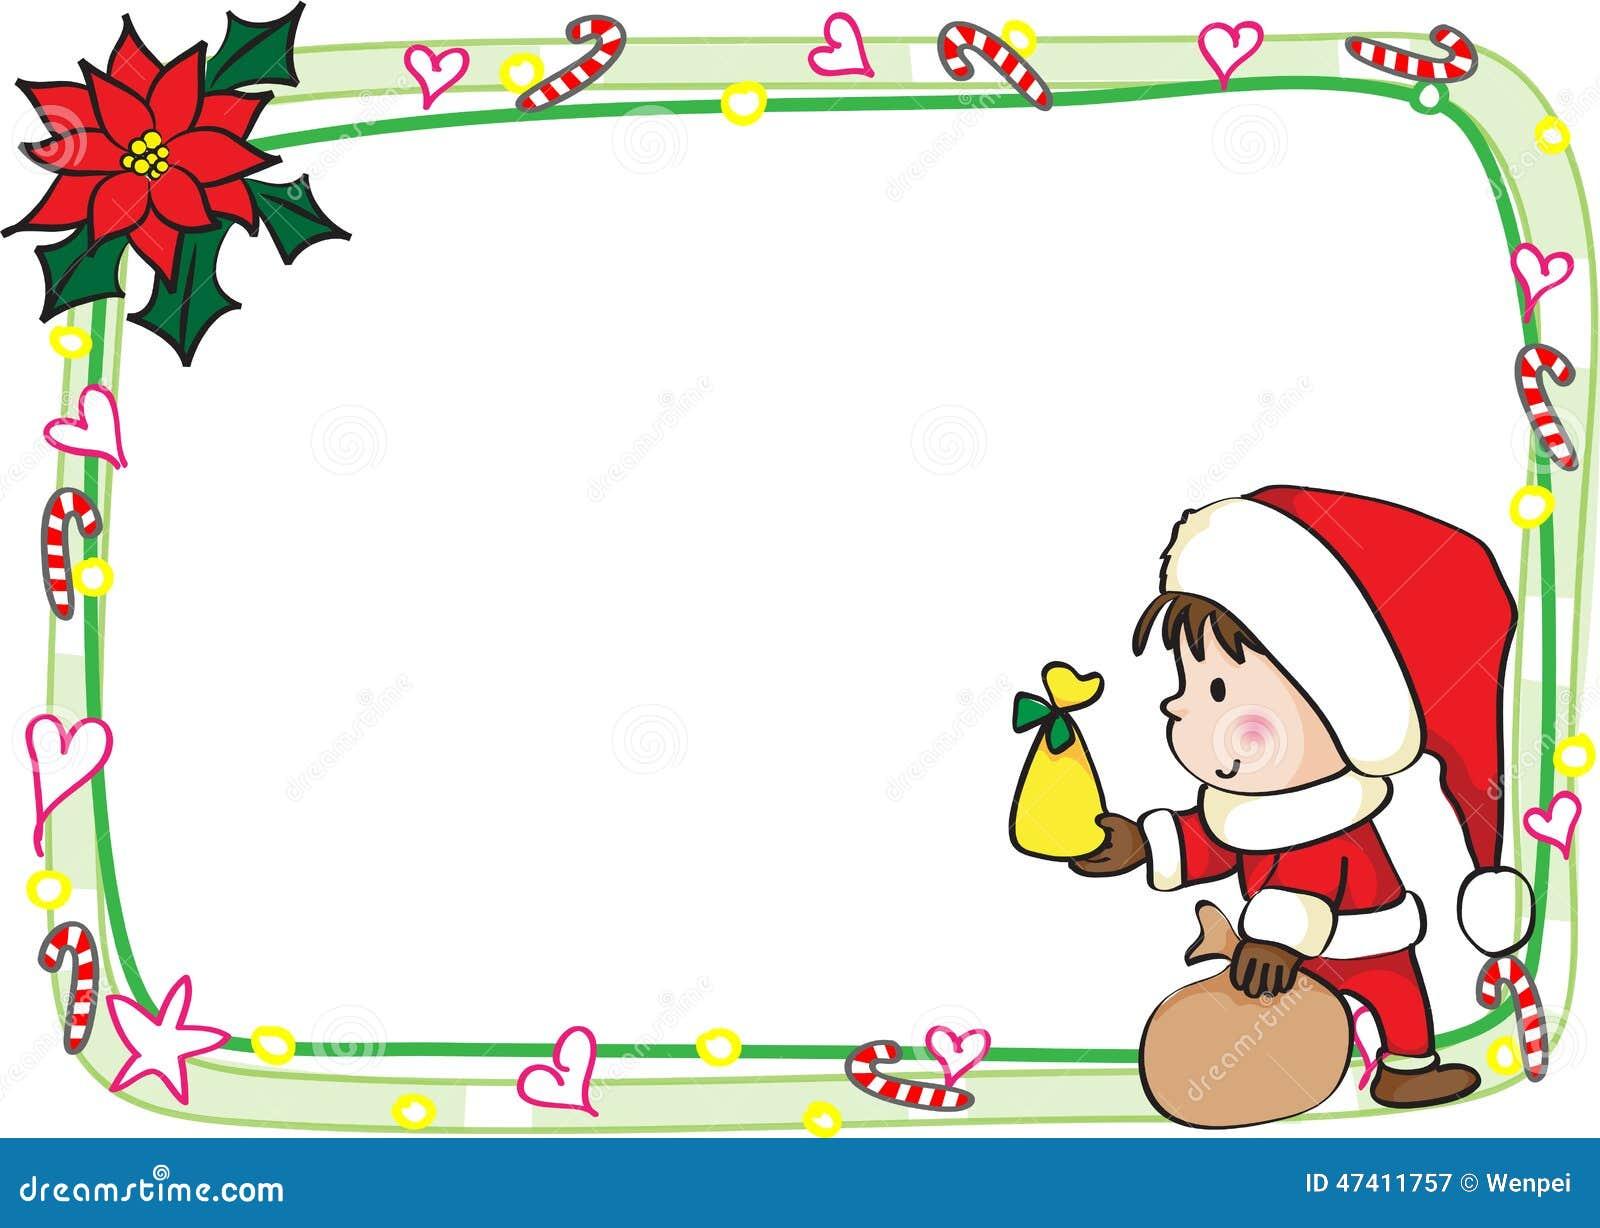 Merry Christmas Card Border Frame Illustration 47411757 Megapixl